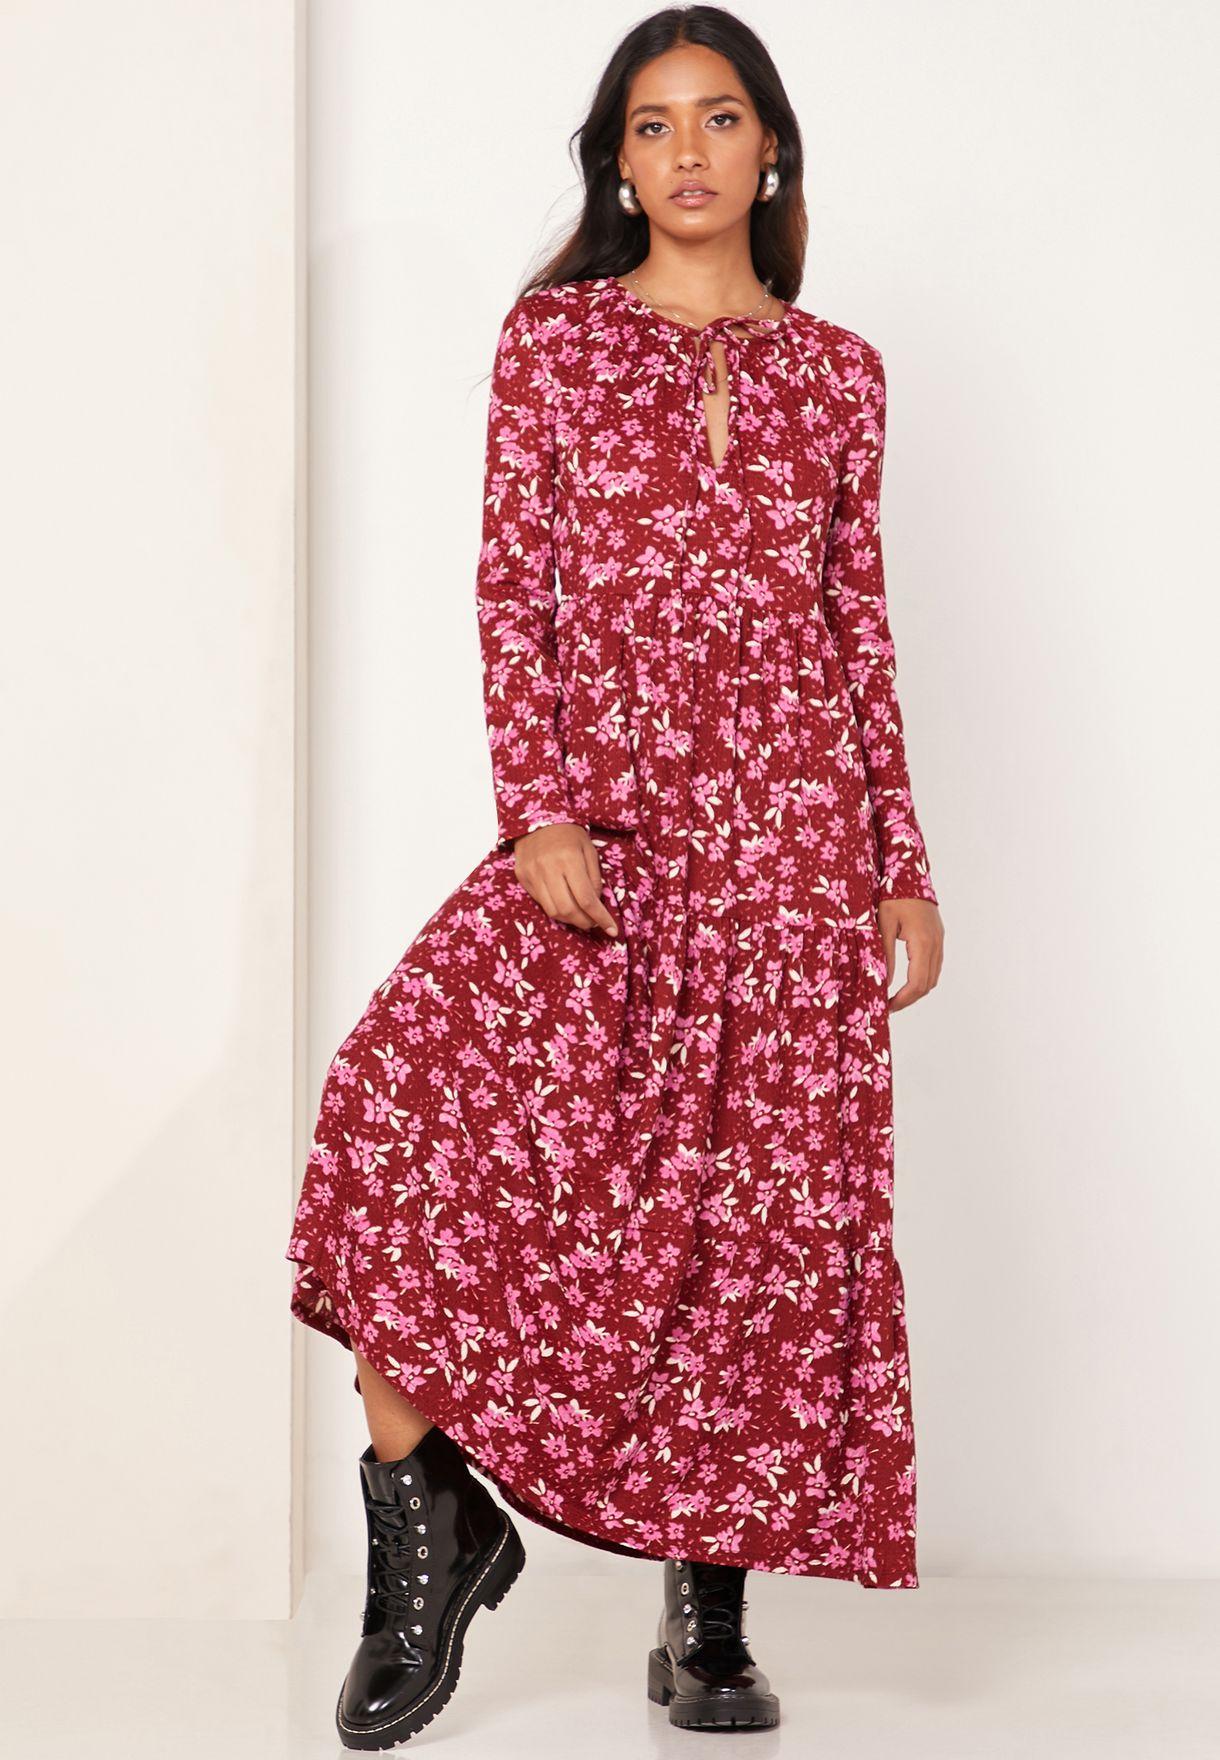 Tiers Floral Print Dress